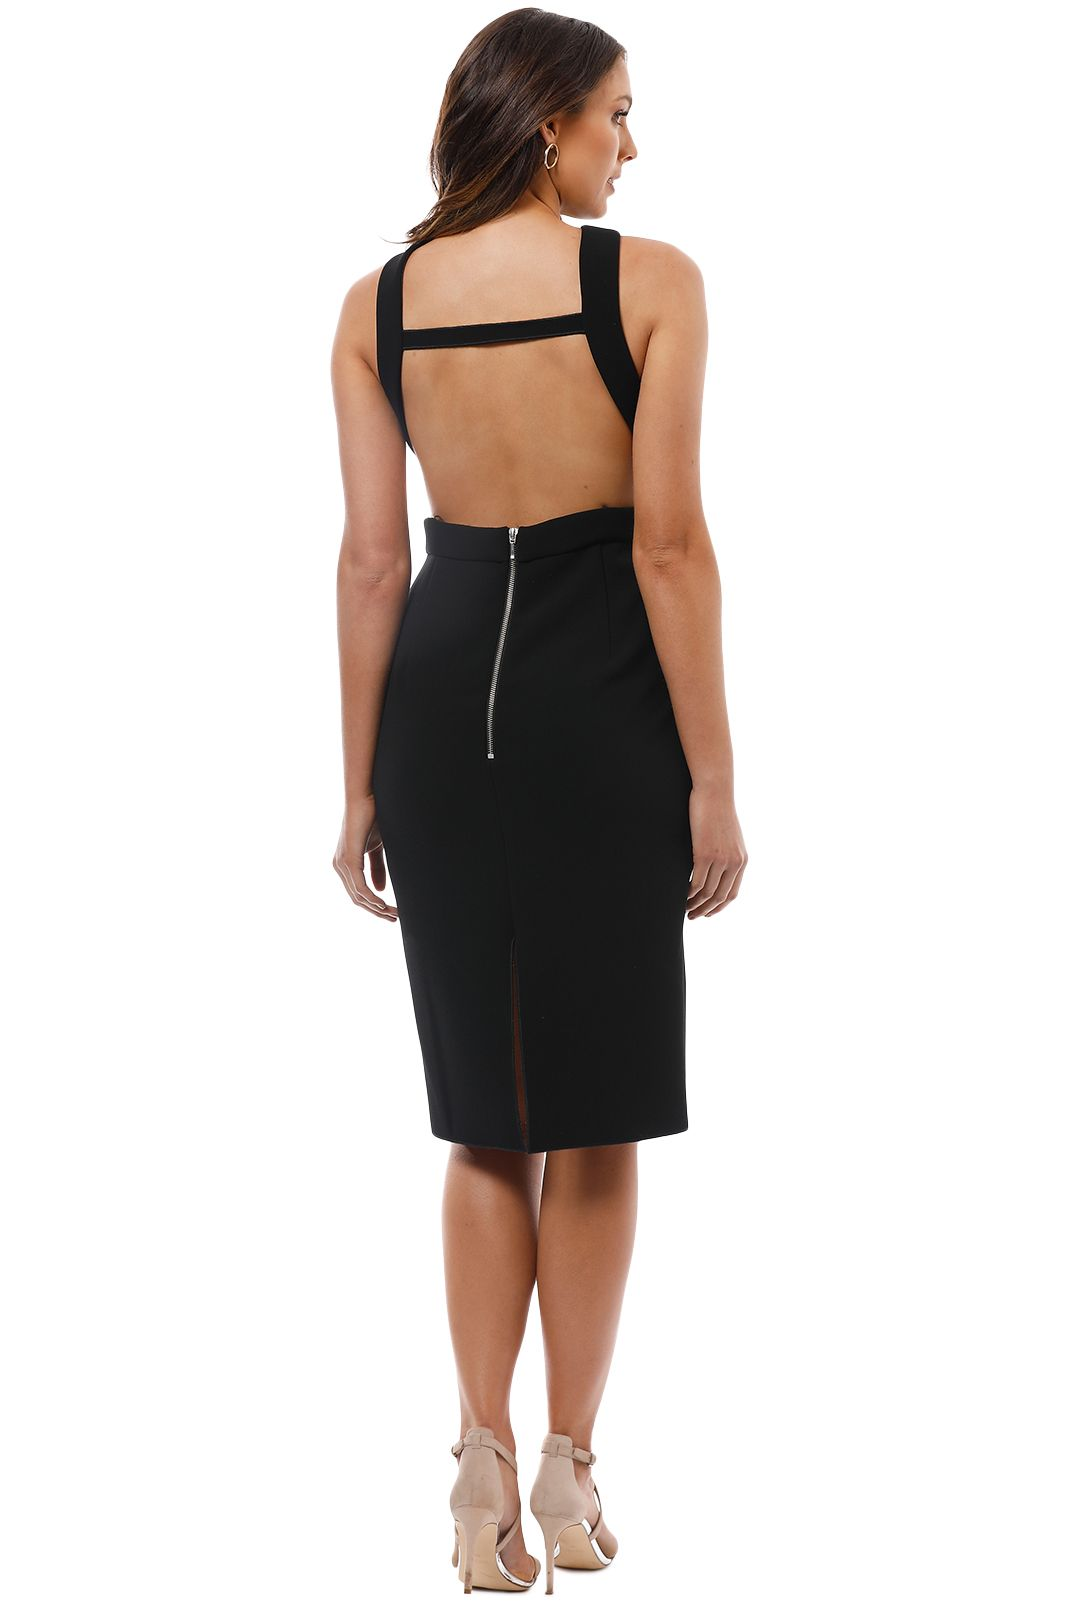 Yeojin Bae - Double Crepe Sophie Dress - Black - Back